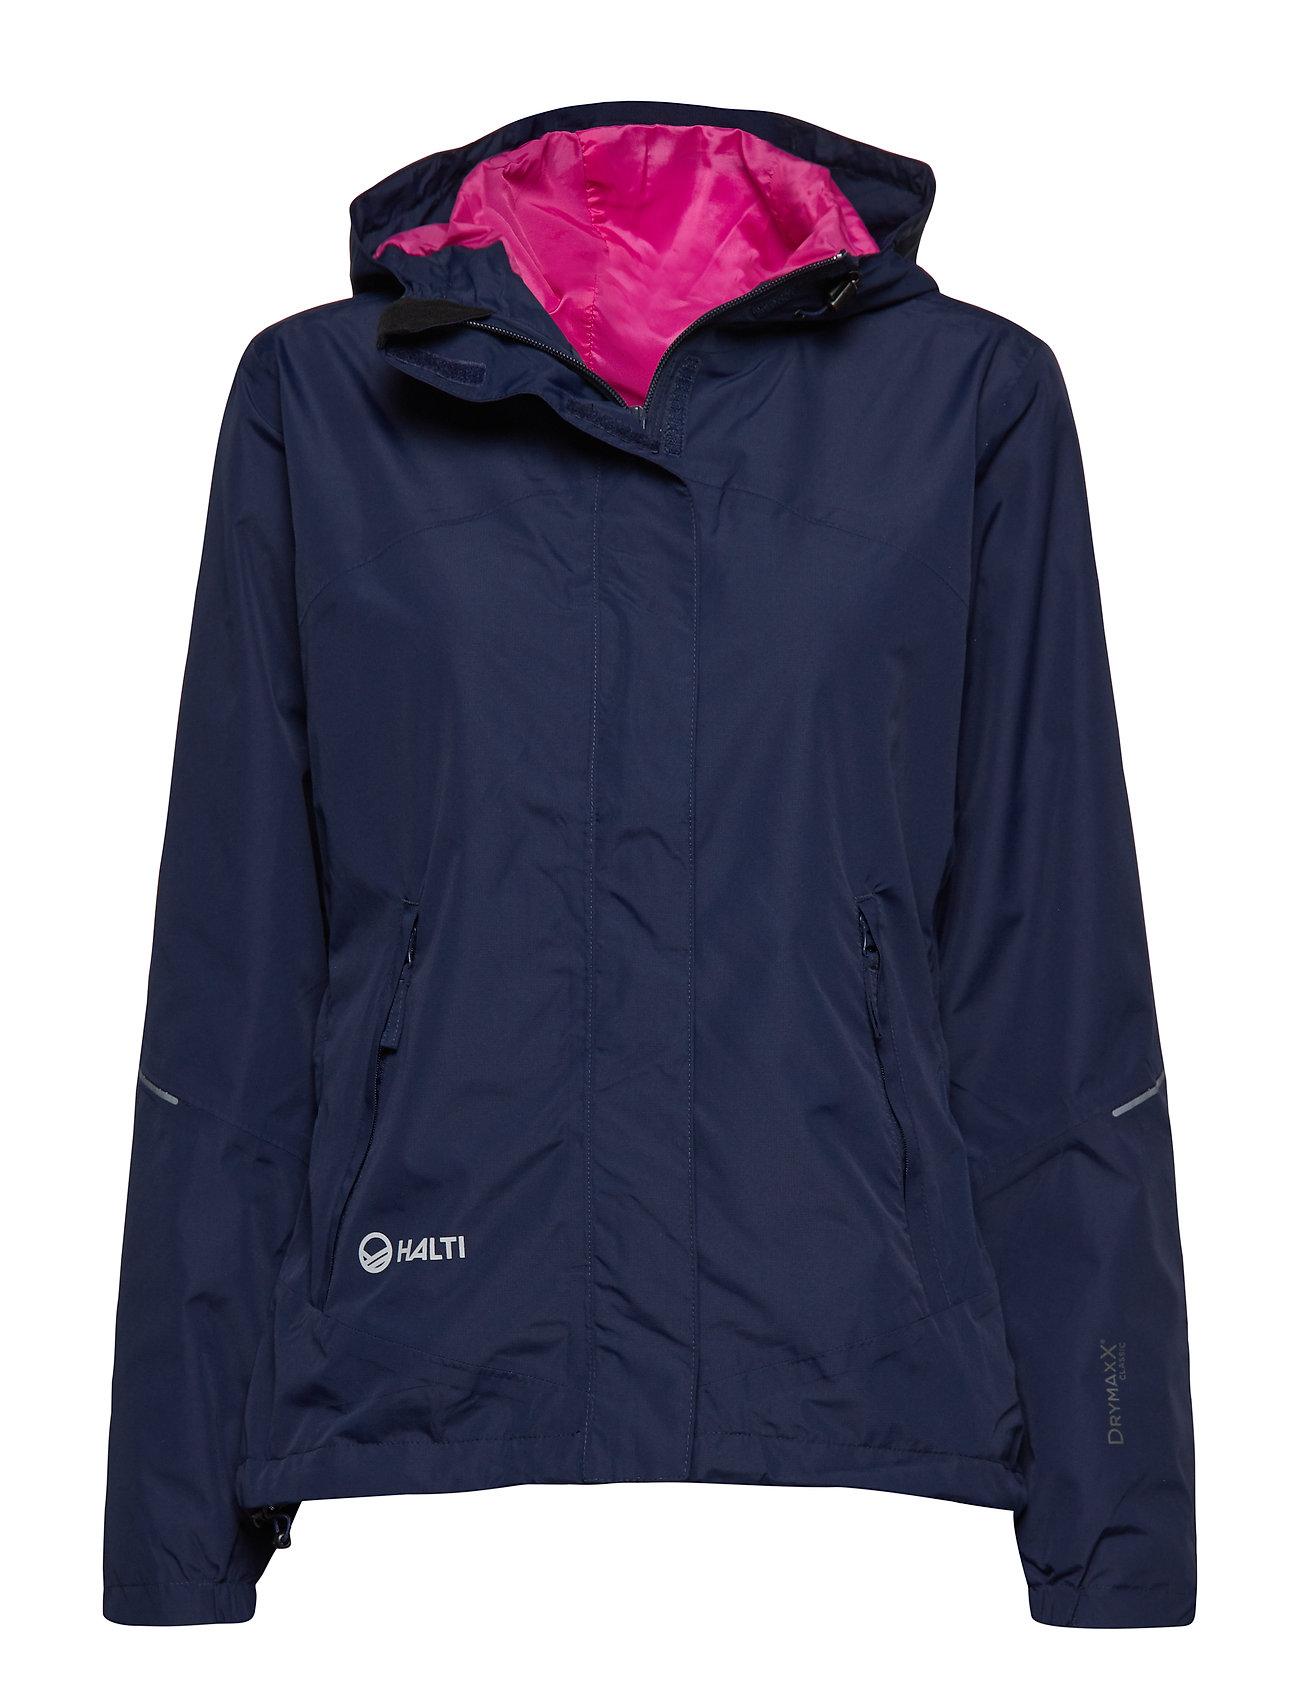 Halti Caima Women's DX Shell Jacket